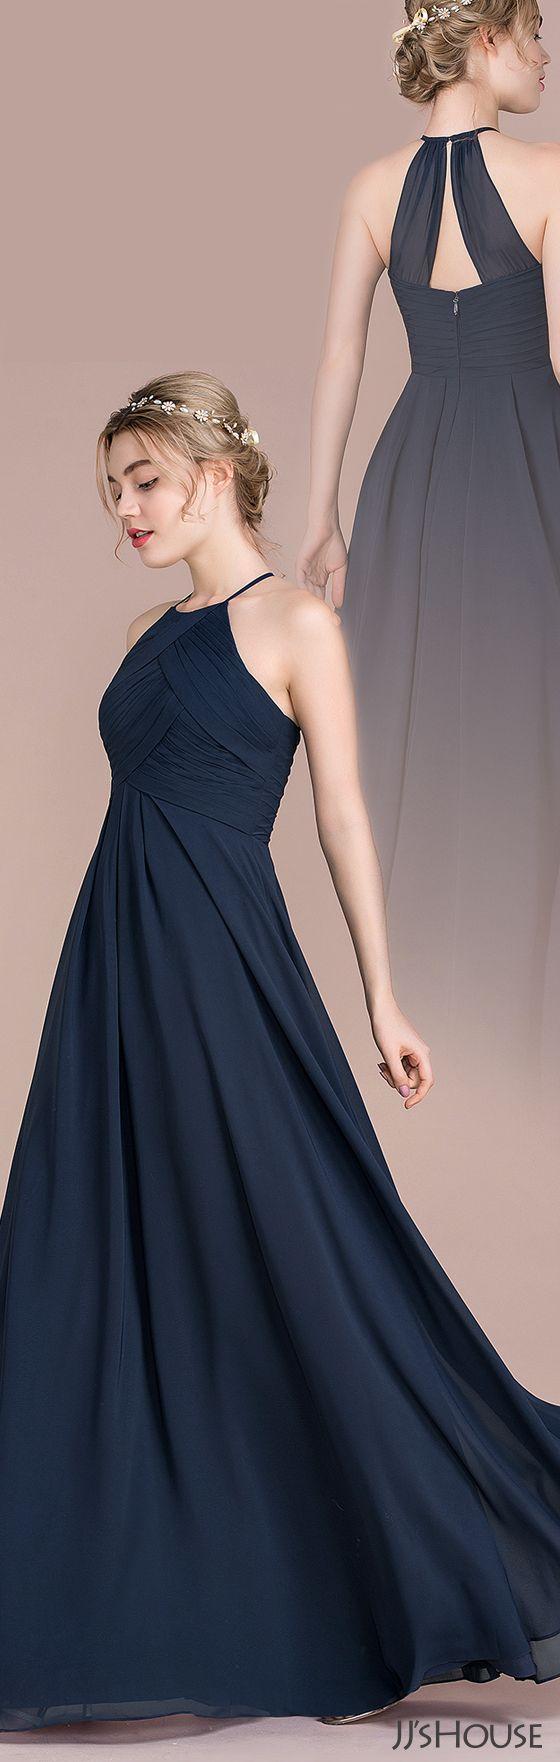 JJsHouse A-Line/Princess Scoop Neck Floor-Length Chiffon Bridesmaid Dress With Ruffle